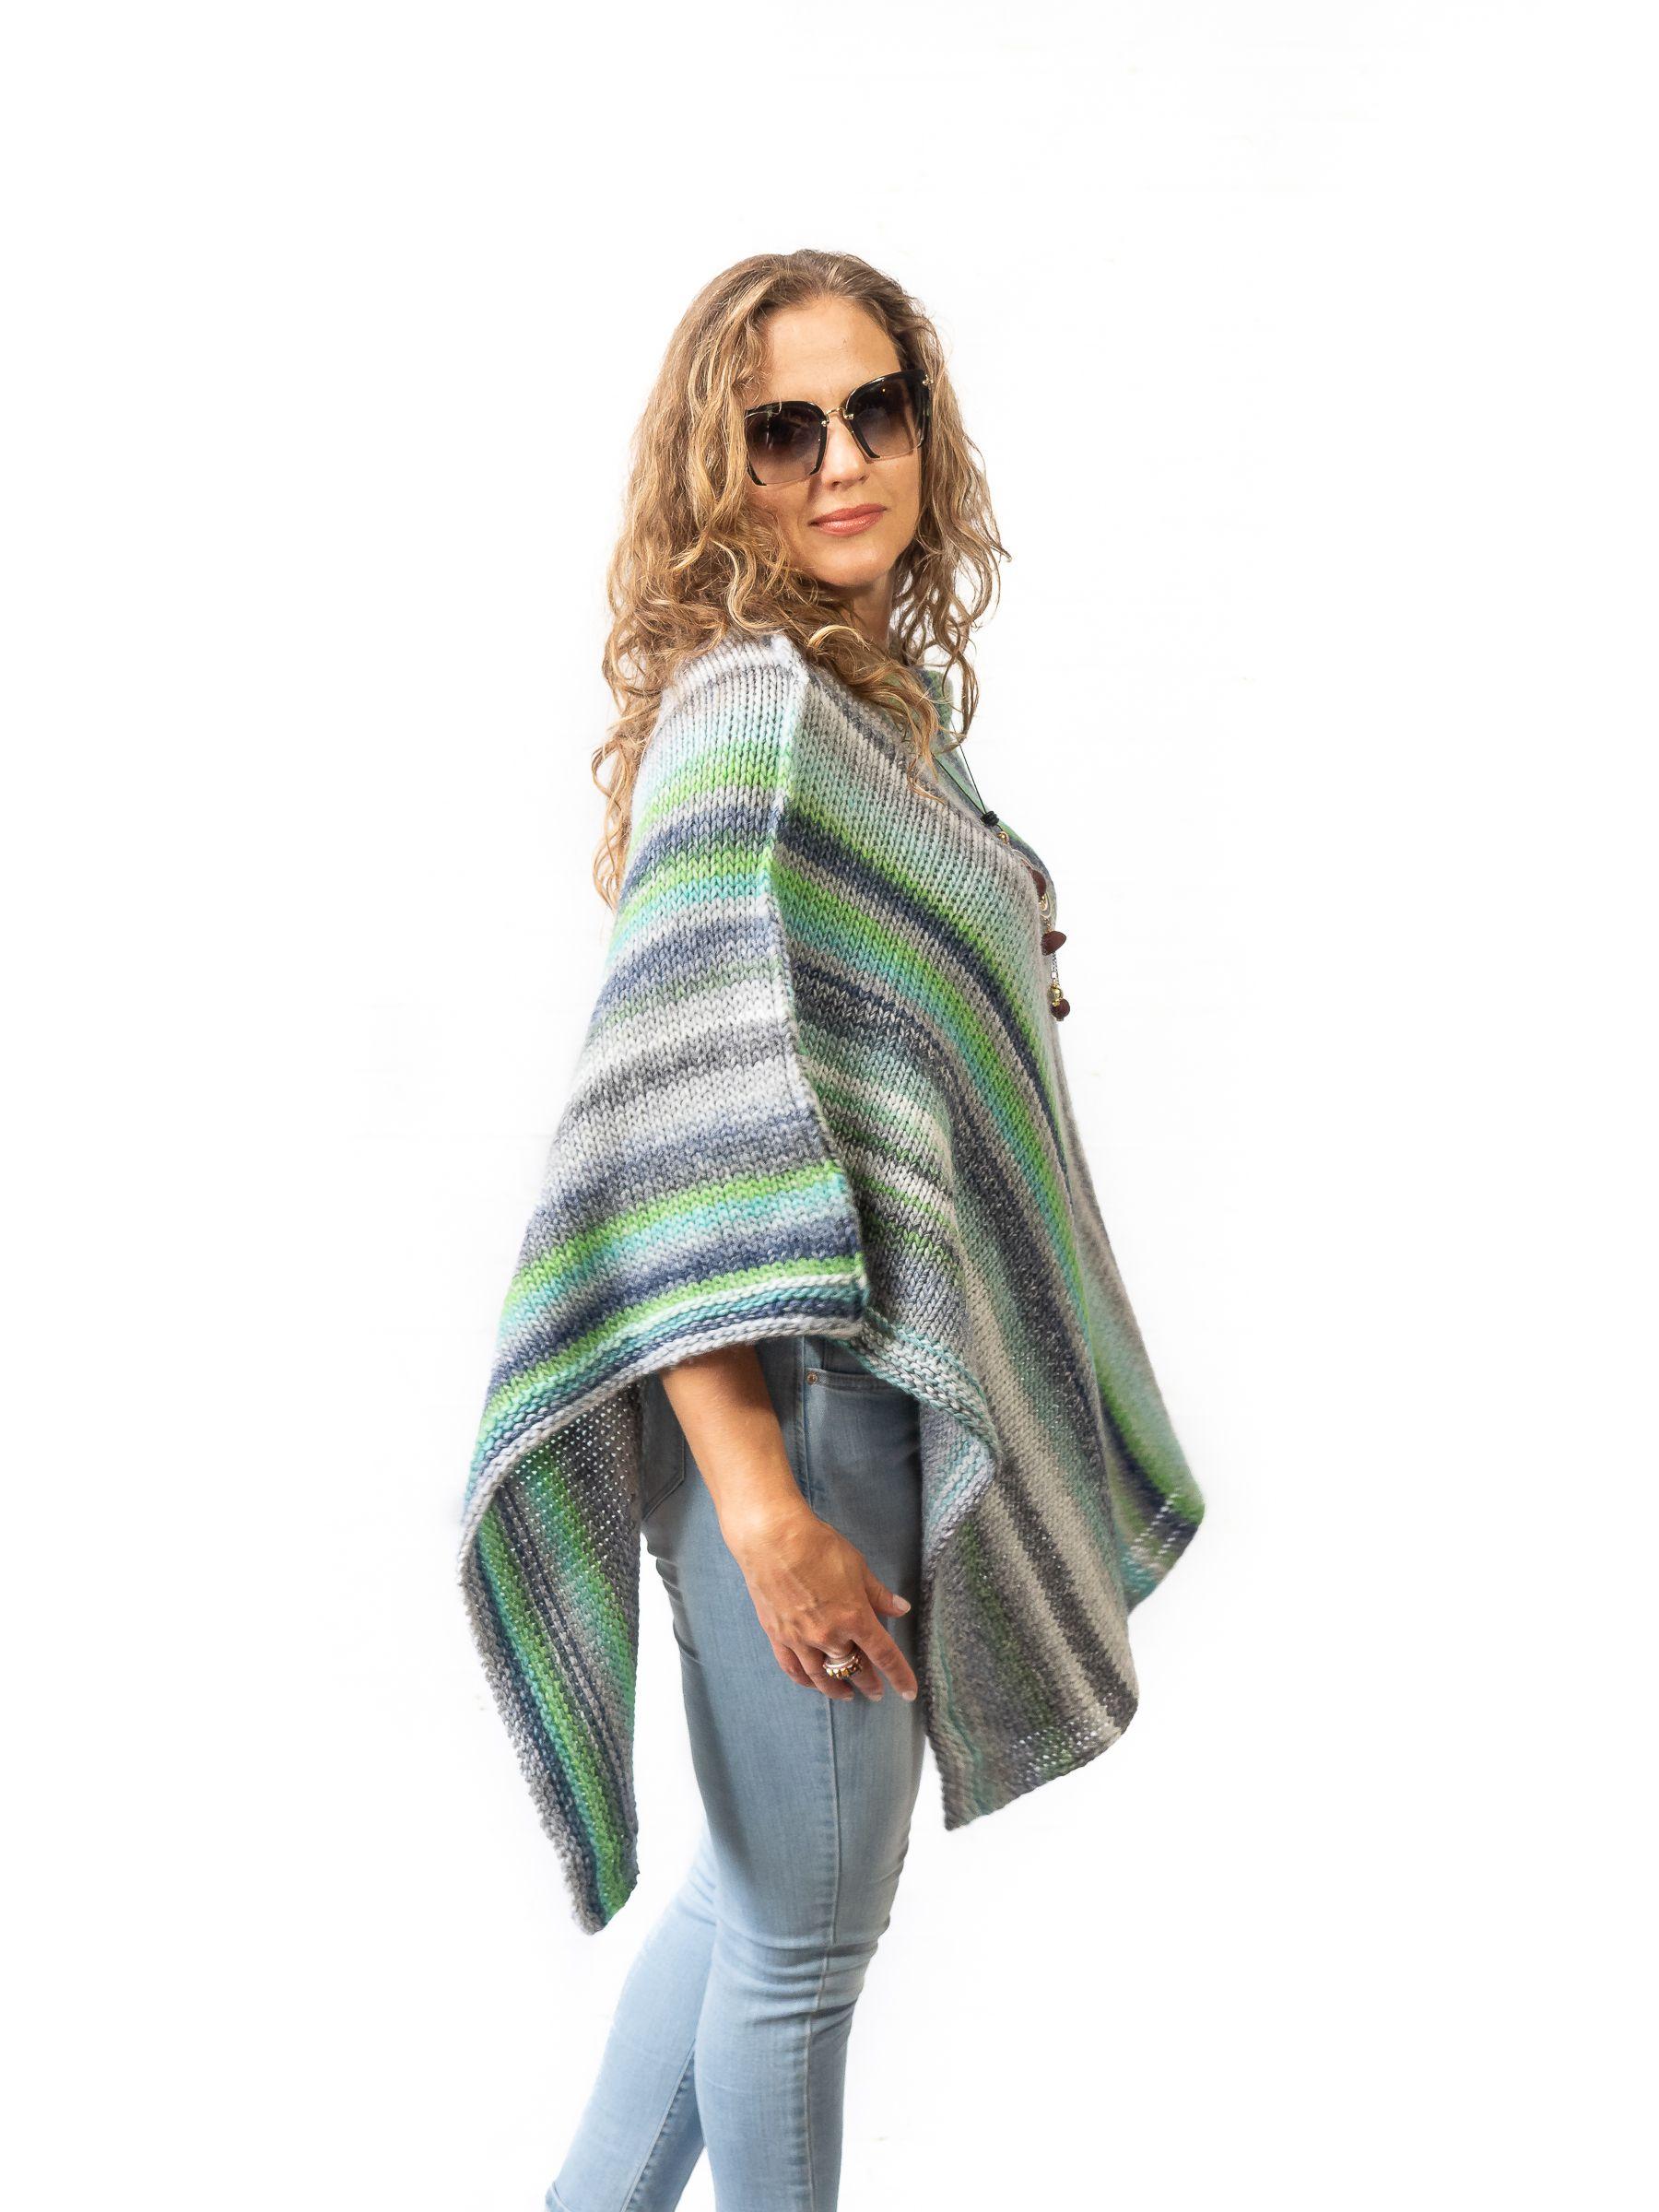 womenclothing gray sweater knitting poncho